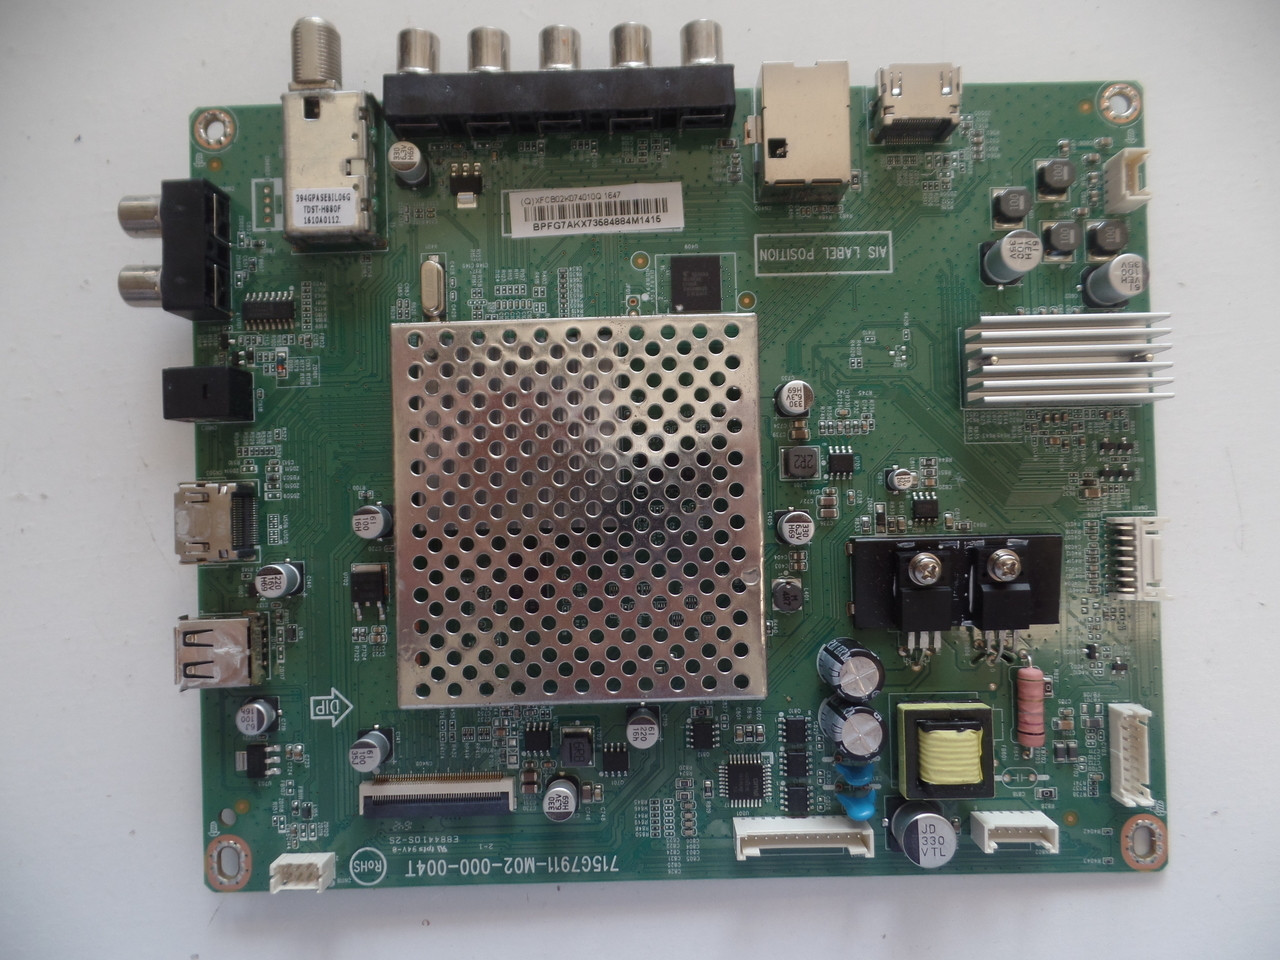 Vizio 756TXFCB02K0740 Main Board for D40-D1 LTTETVCS,LTBETVCS,LTBETVFS Serial